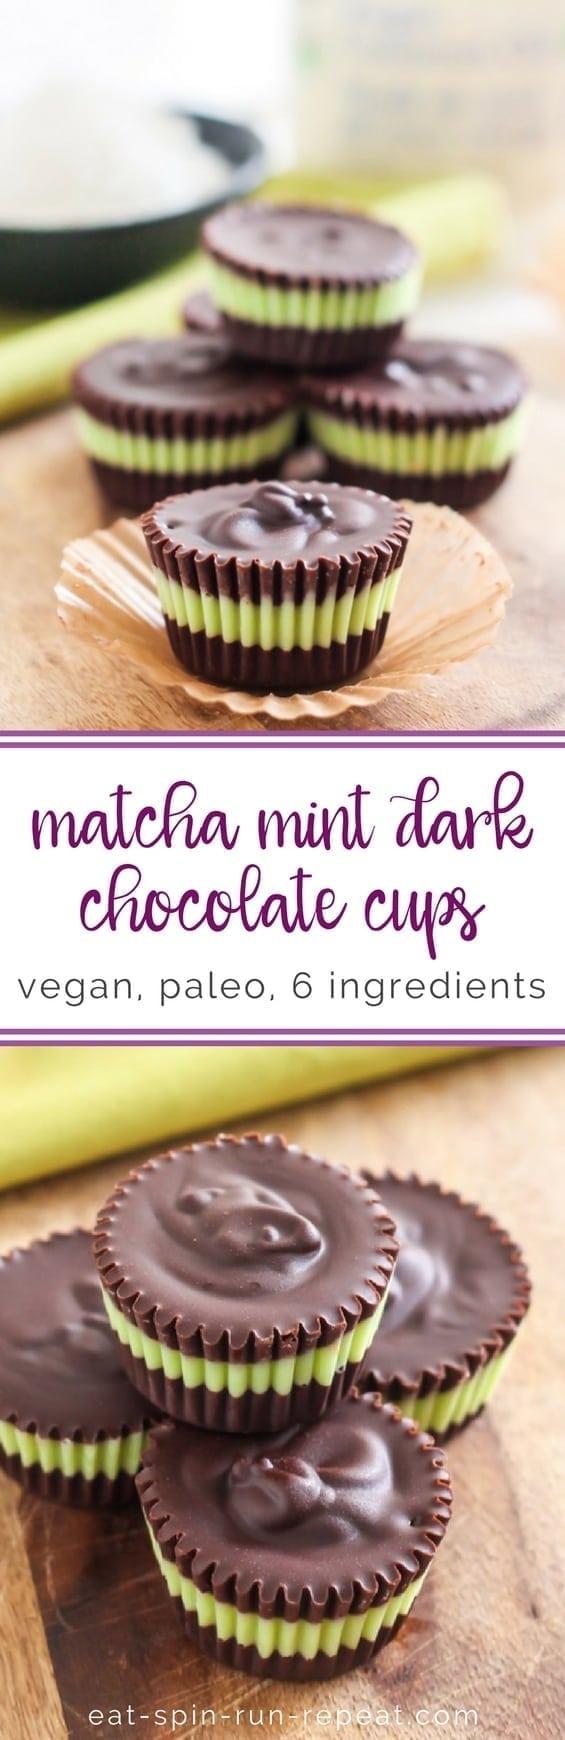 6-Ingredient Matcha Mint Dark Chocolate Cups || vegan + nut-free || Eat Spin Run Repeat